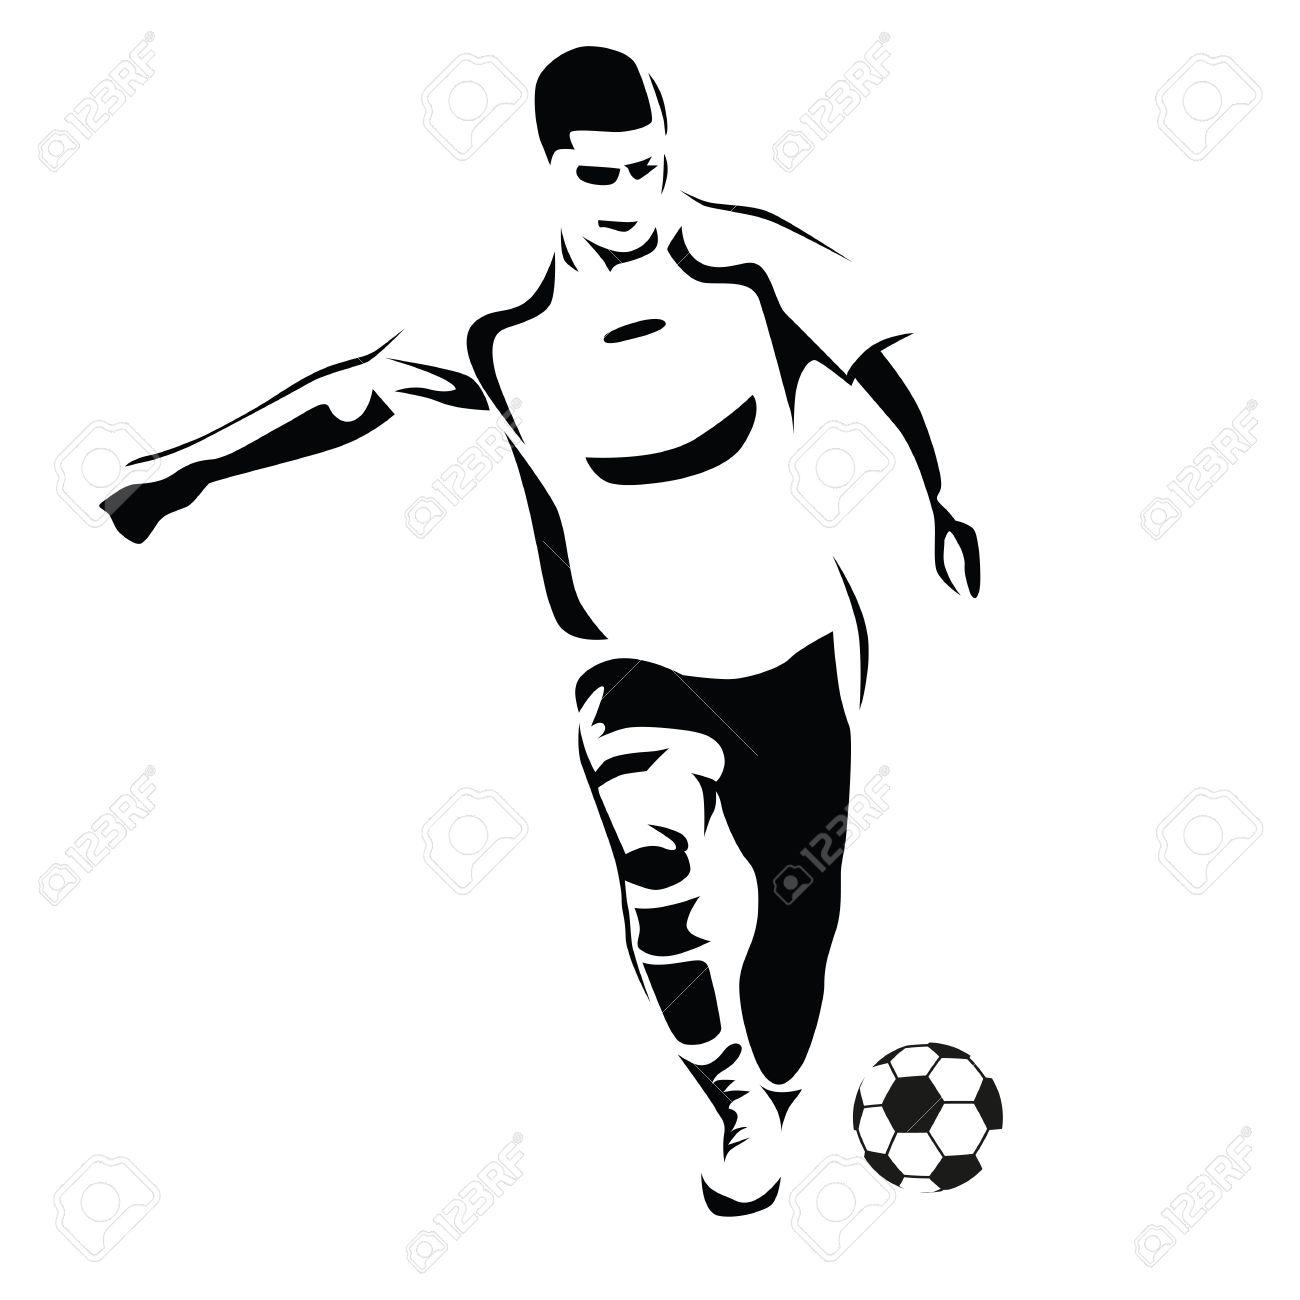 1300x1300 Soccer Player Vector Silhouette. Running Football Player. Kick